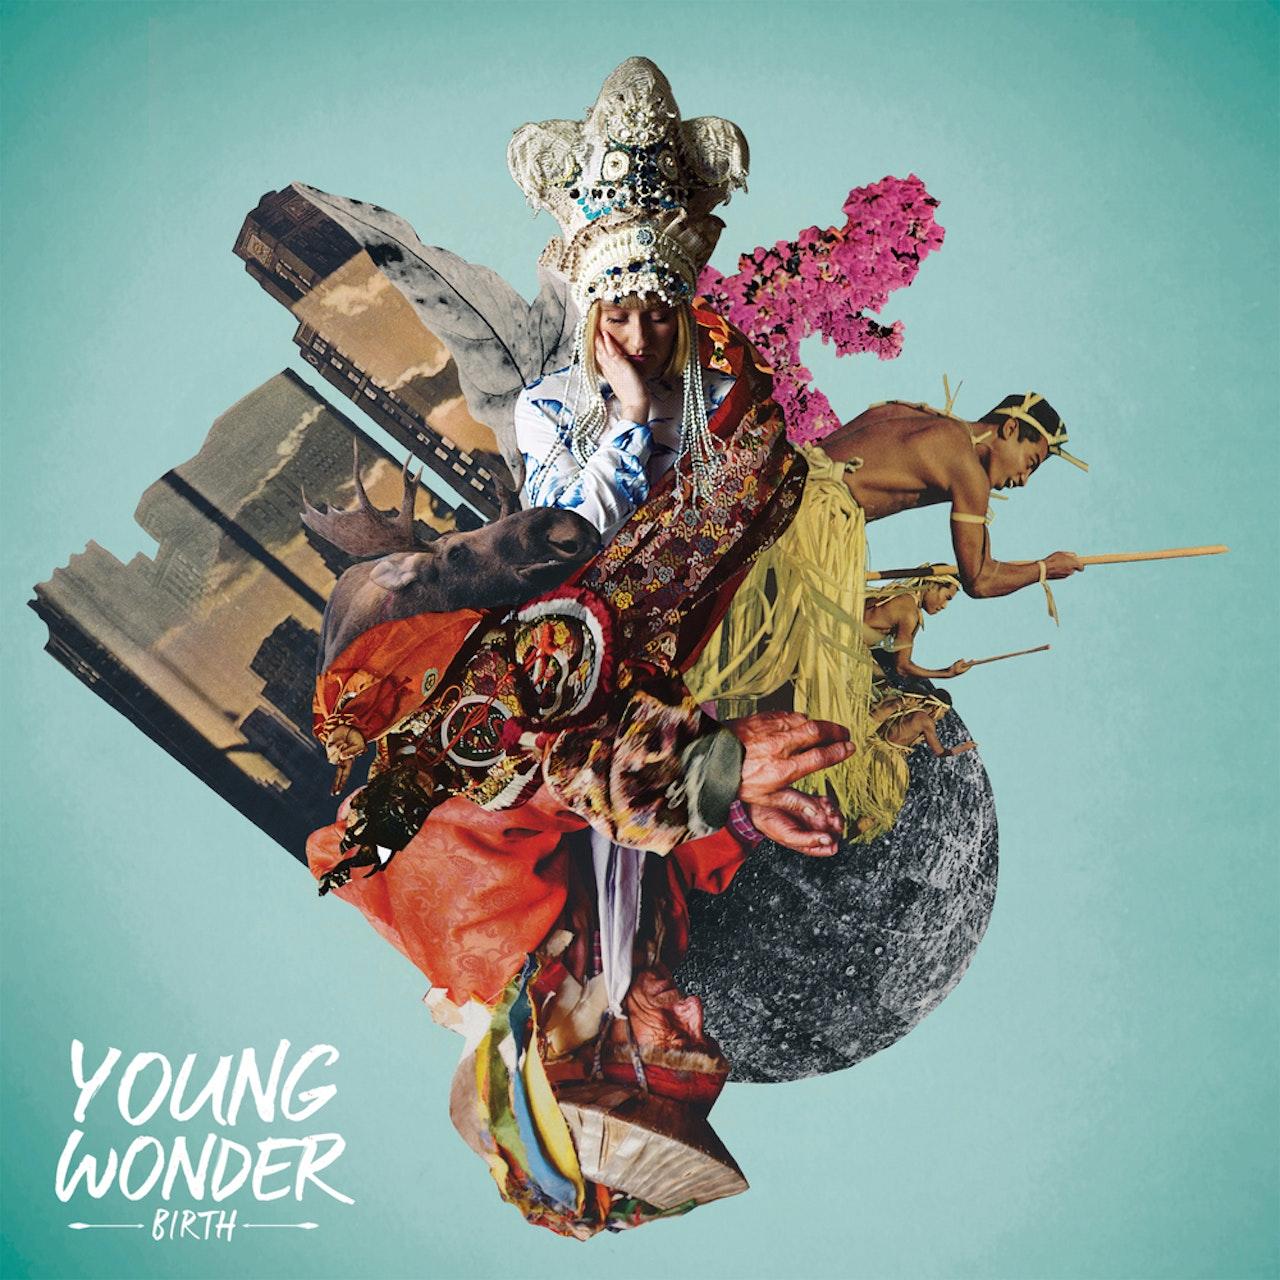 Young Wonder - Birth (LP) ~ 2015